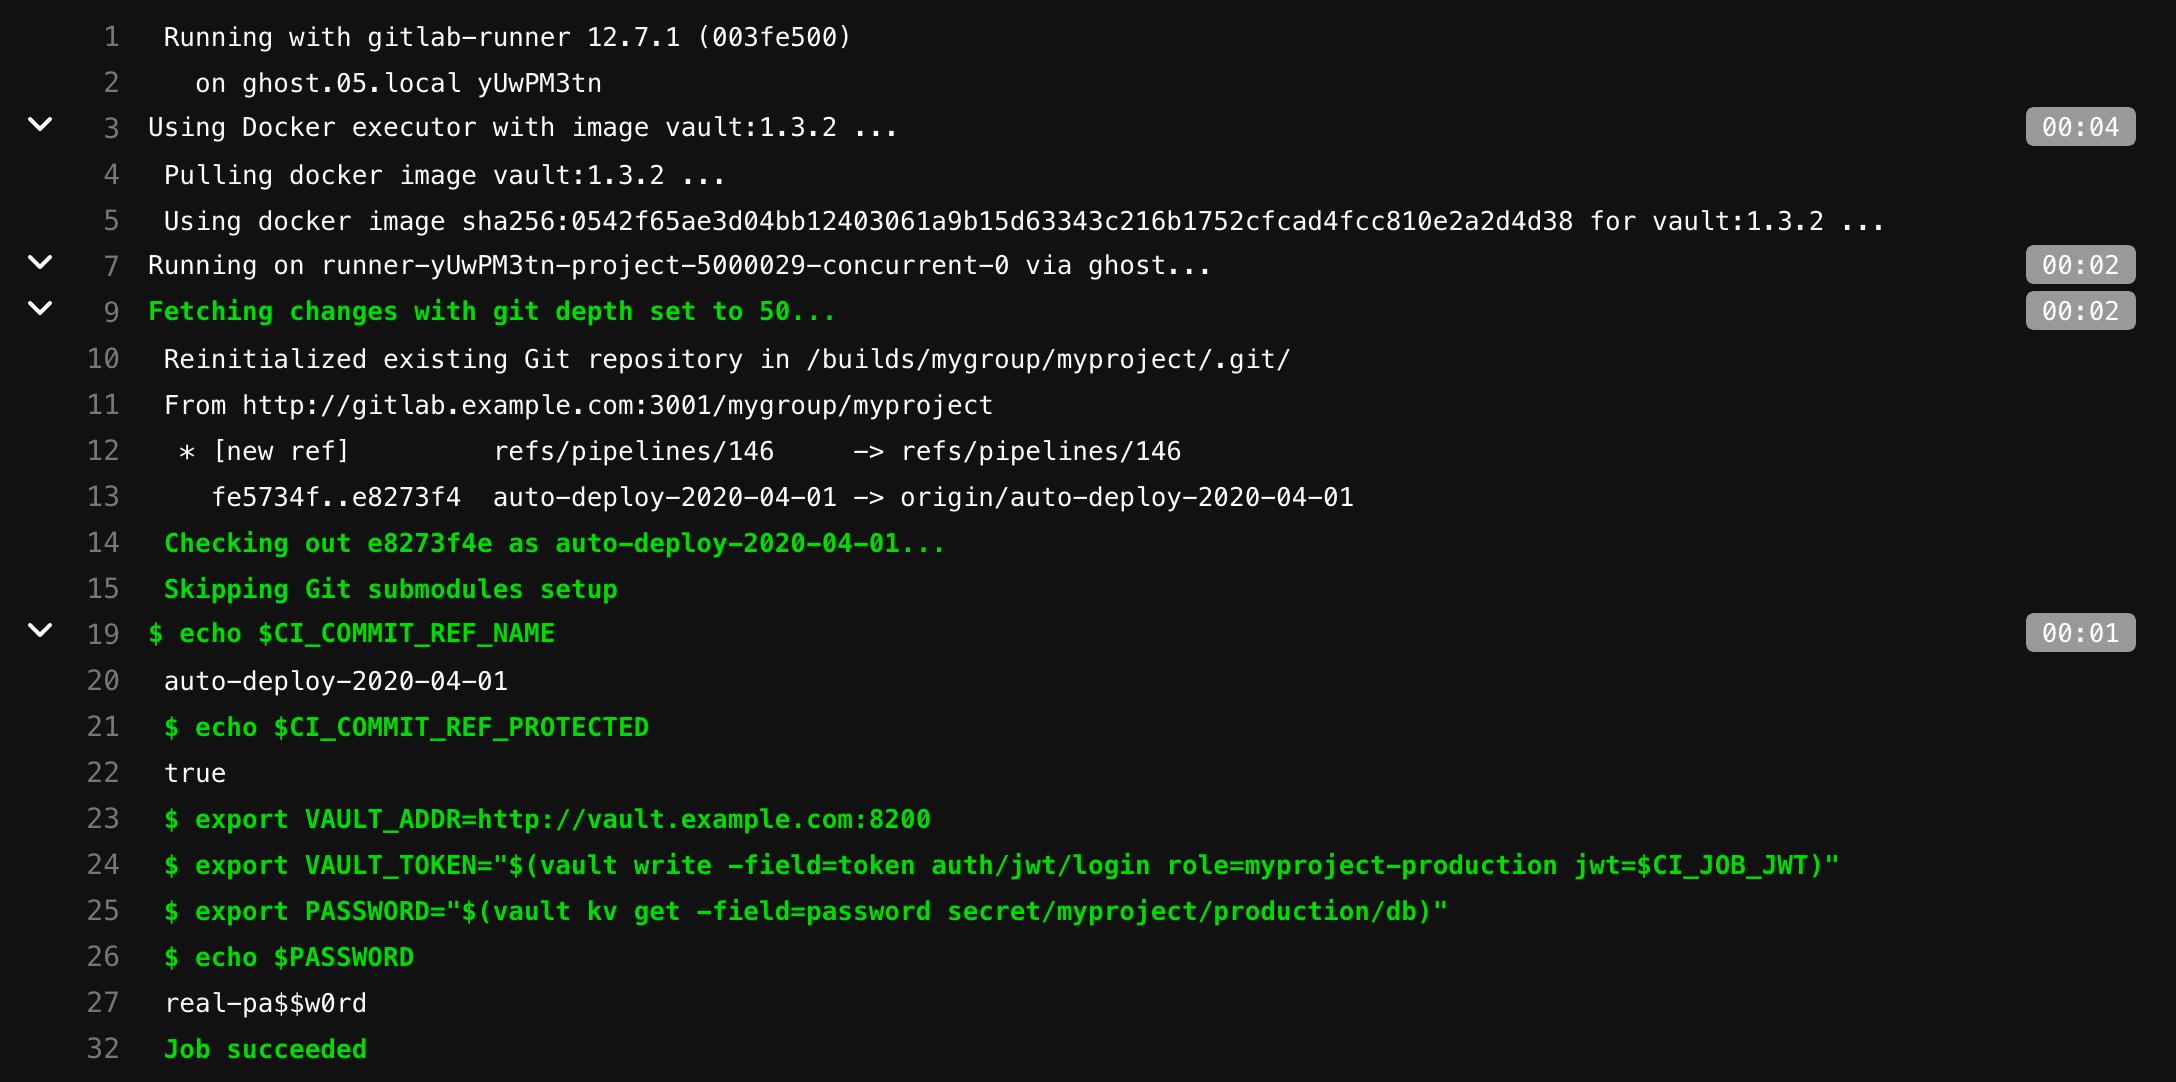 Аутентификация и чтение секретов в HashiCorp's Vault через GitLab CI - 3